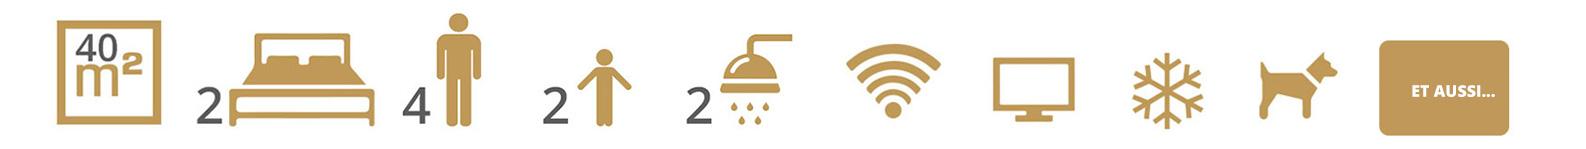 Icônes des services du camping